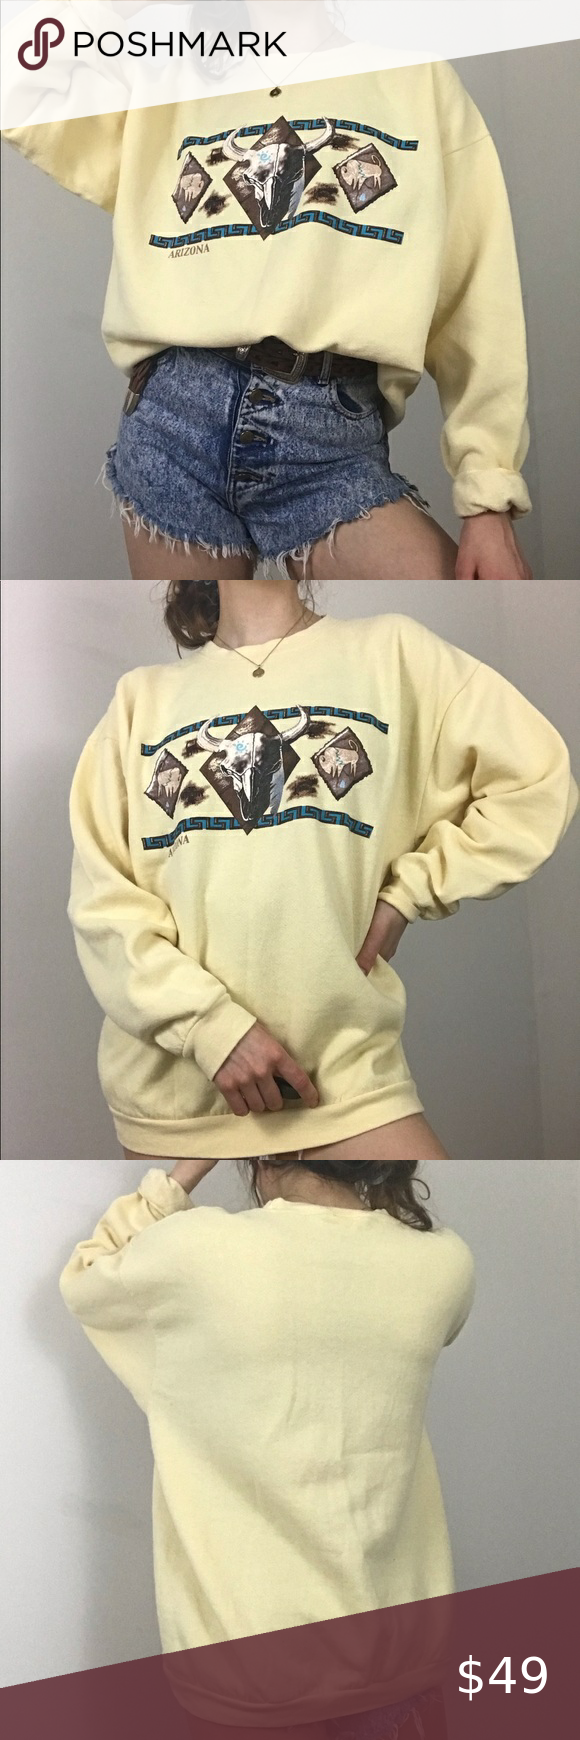 Vintage 90s Yellow Longhorn Skull Arizona Crewneck Novelty Sweater Top Shirt Sweatshirt Tops [ 1740 x 580 Pixel ]